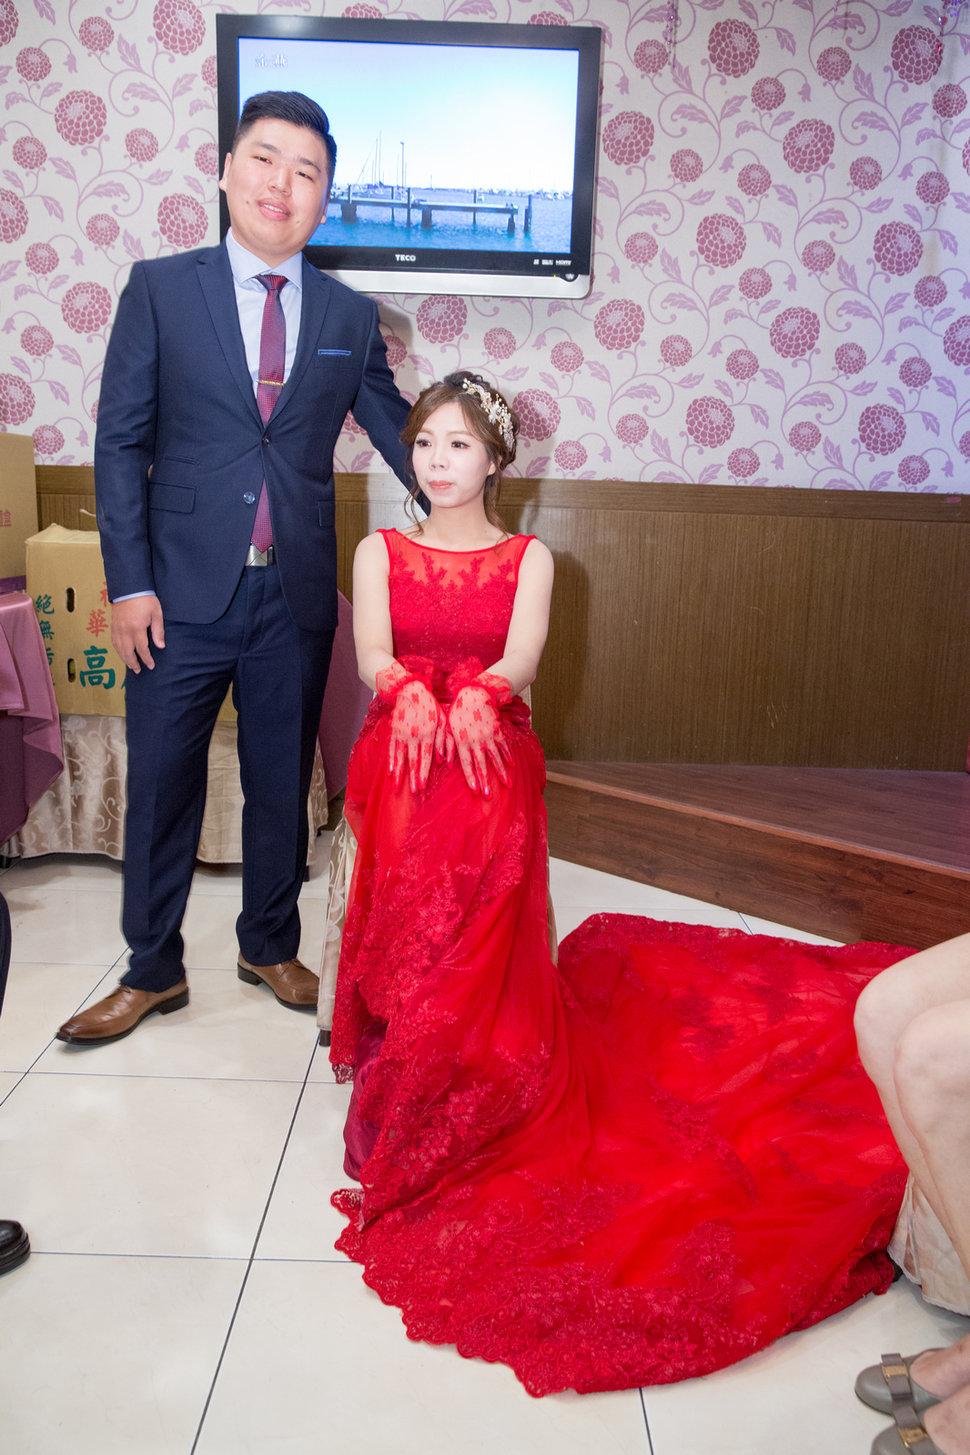 HANK9533 - 蛋拔婚禮紀錄 - 結婚吧